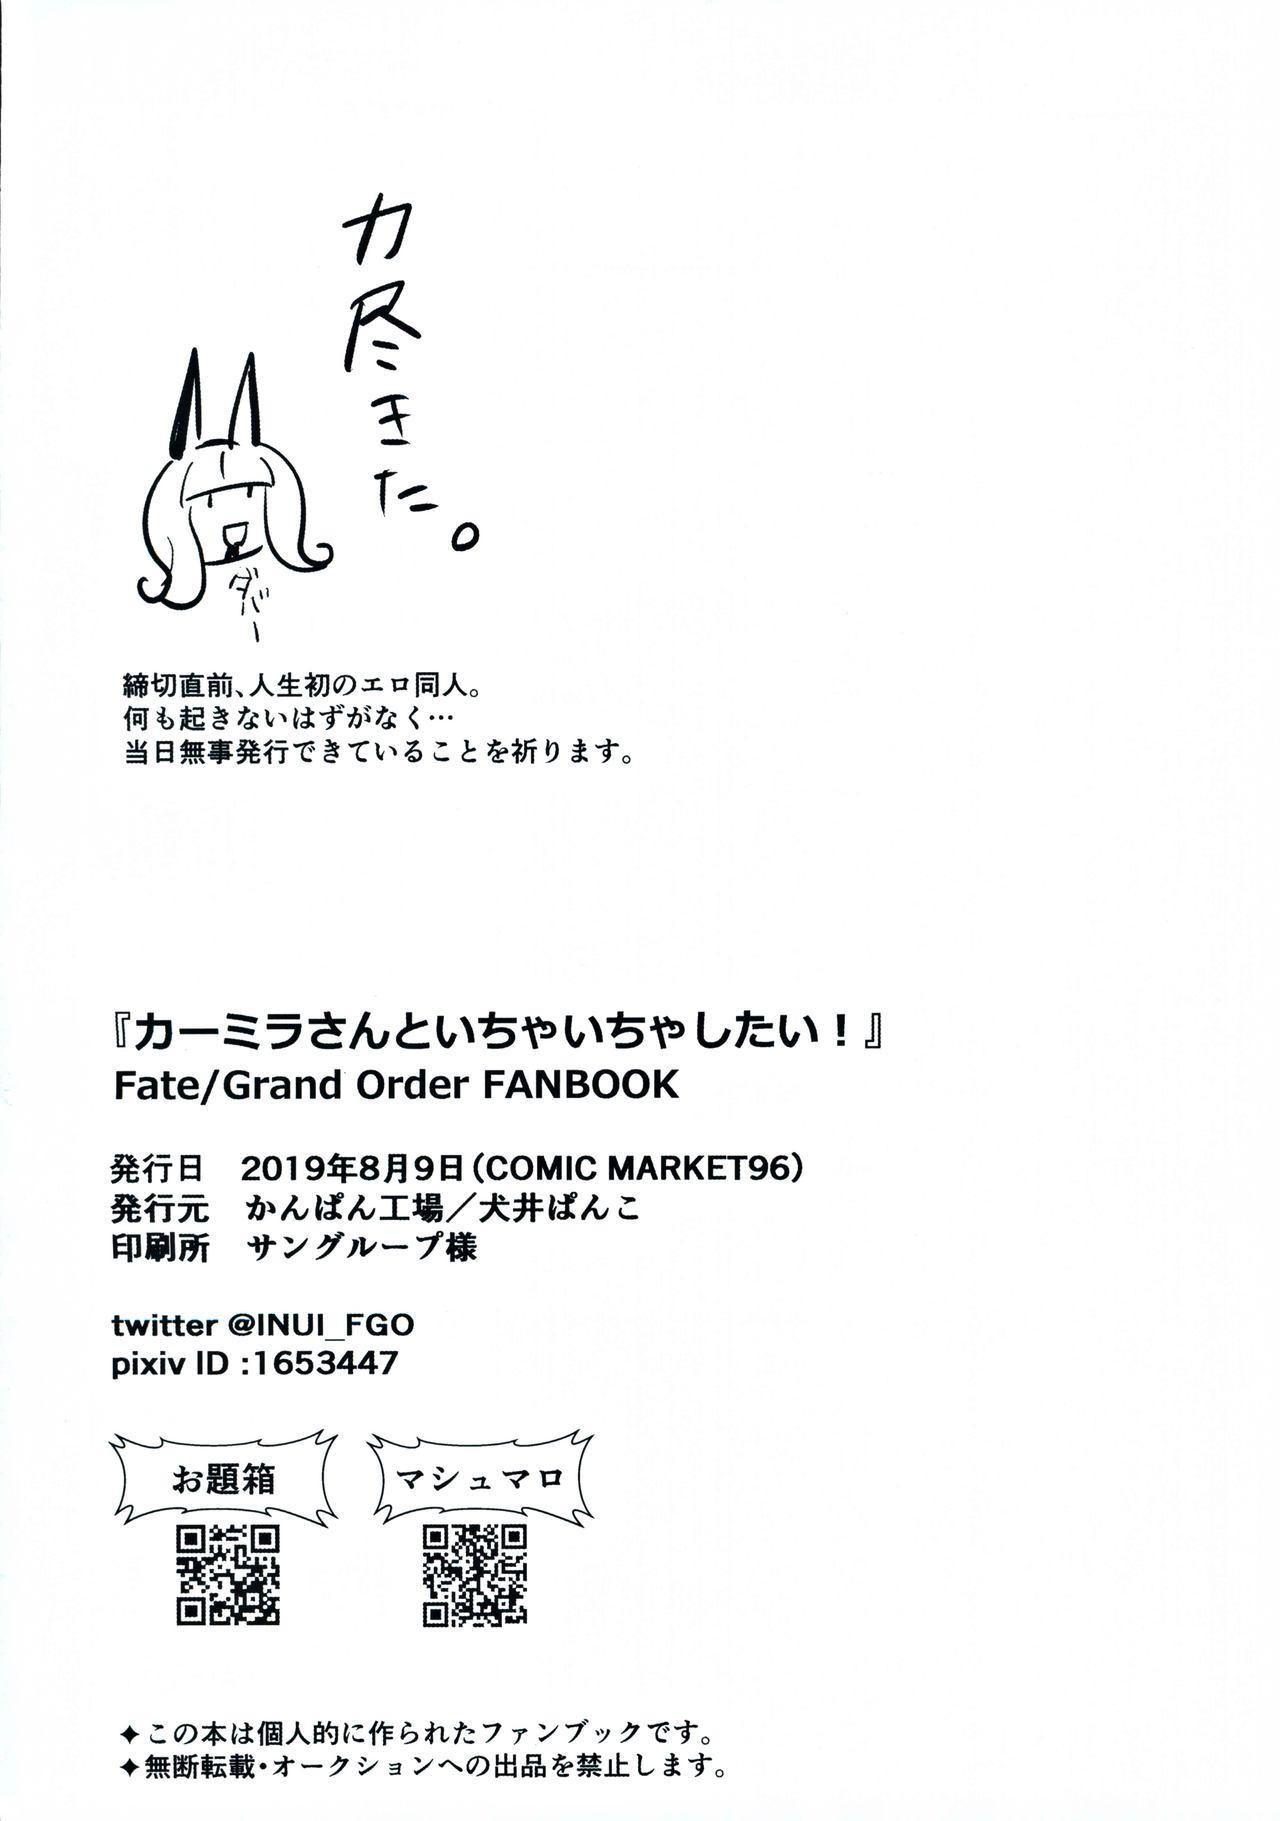 Carmilla-san to Ichaicha Shitai! 20